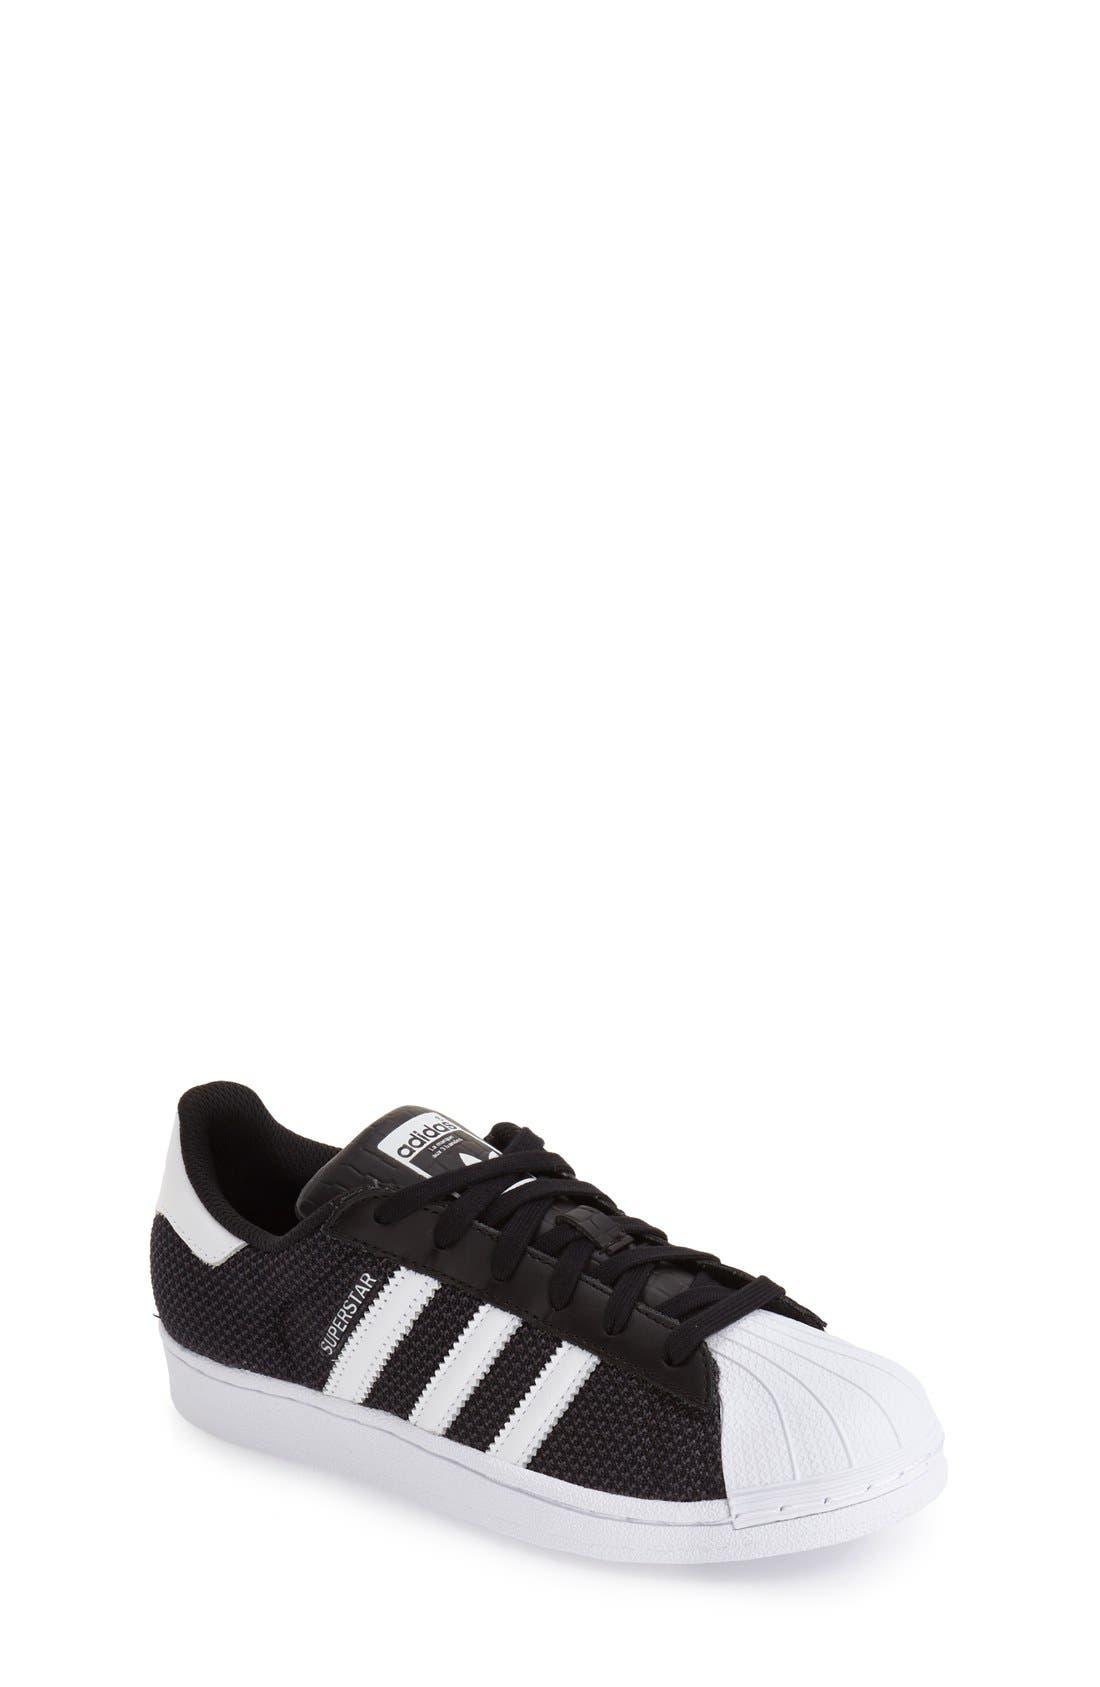 Main Image - adidas 'Superstar' Sneaker (Big Kid)